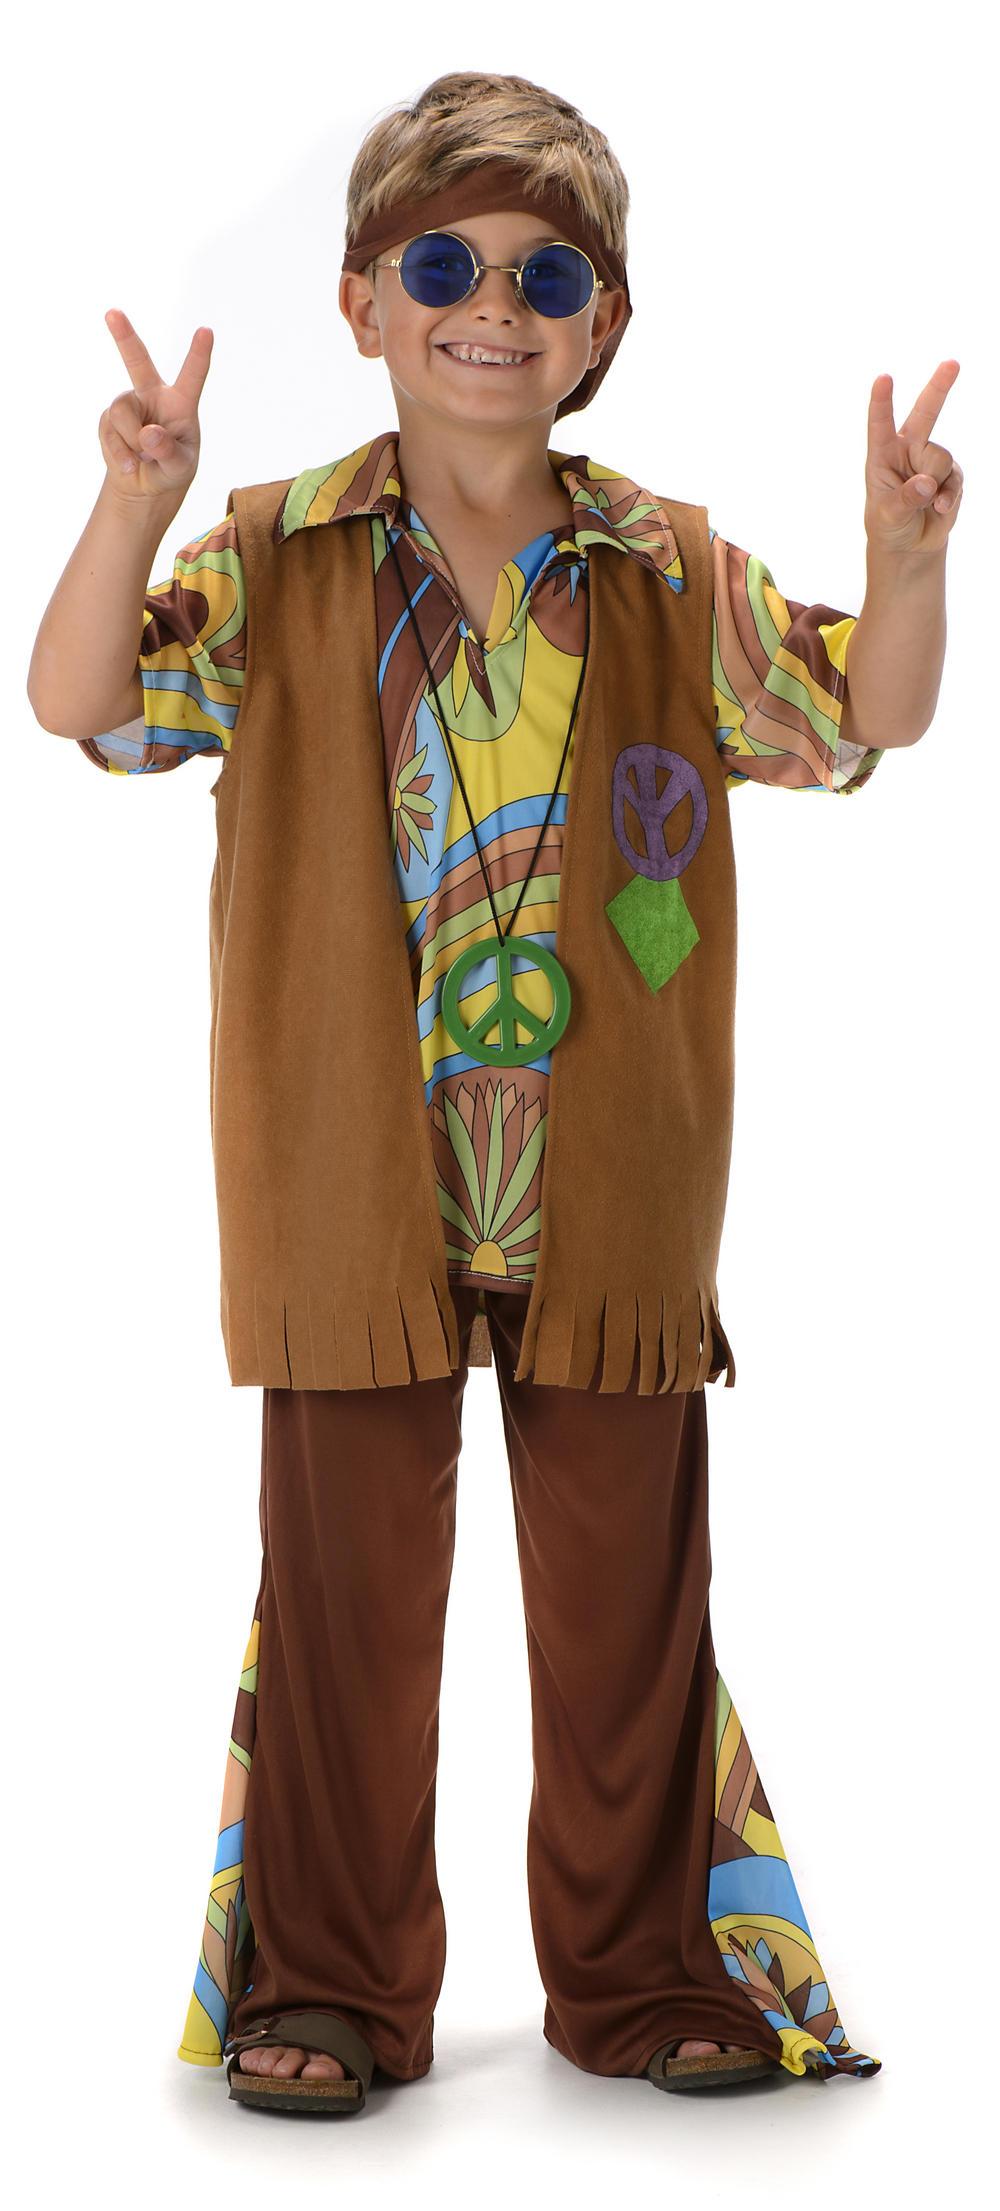 Groovy Hippie Boys Costume | 1960s Costumes | Mega Fancy Dress